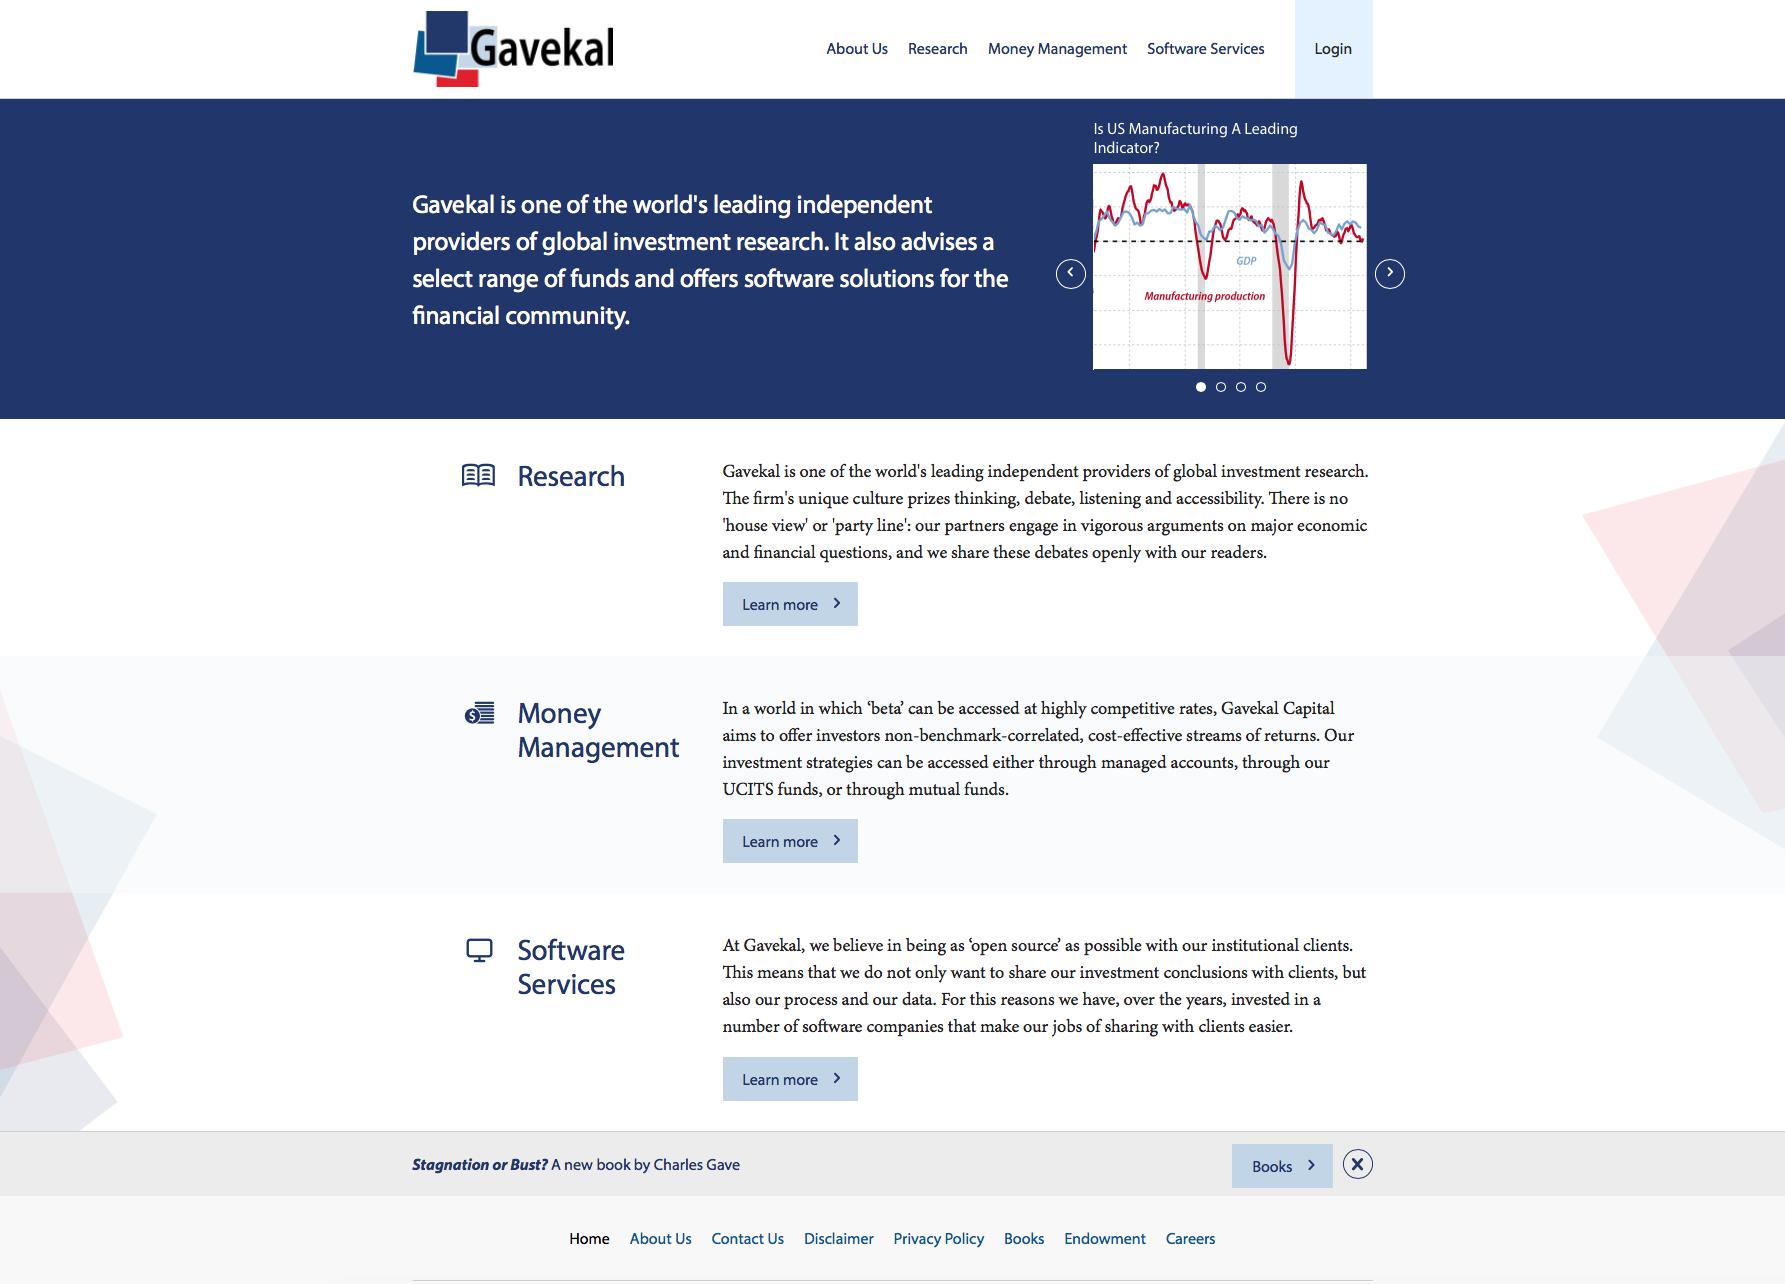 www.gavekal.com